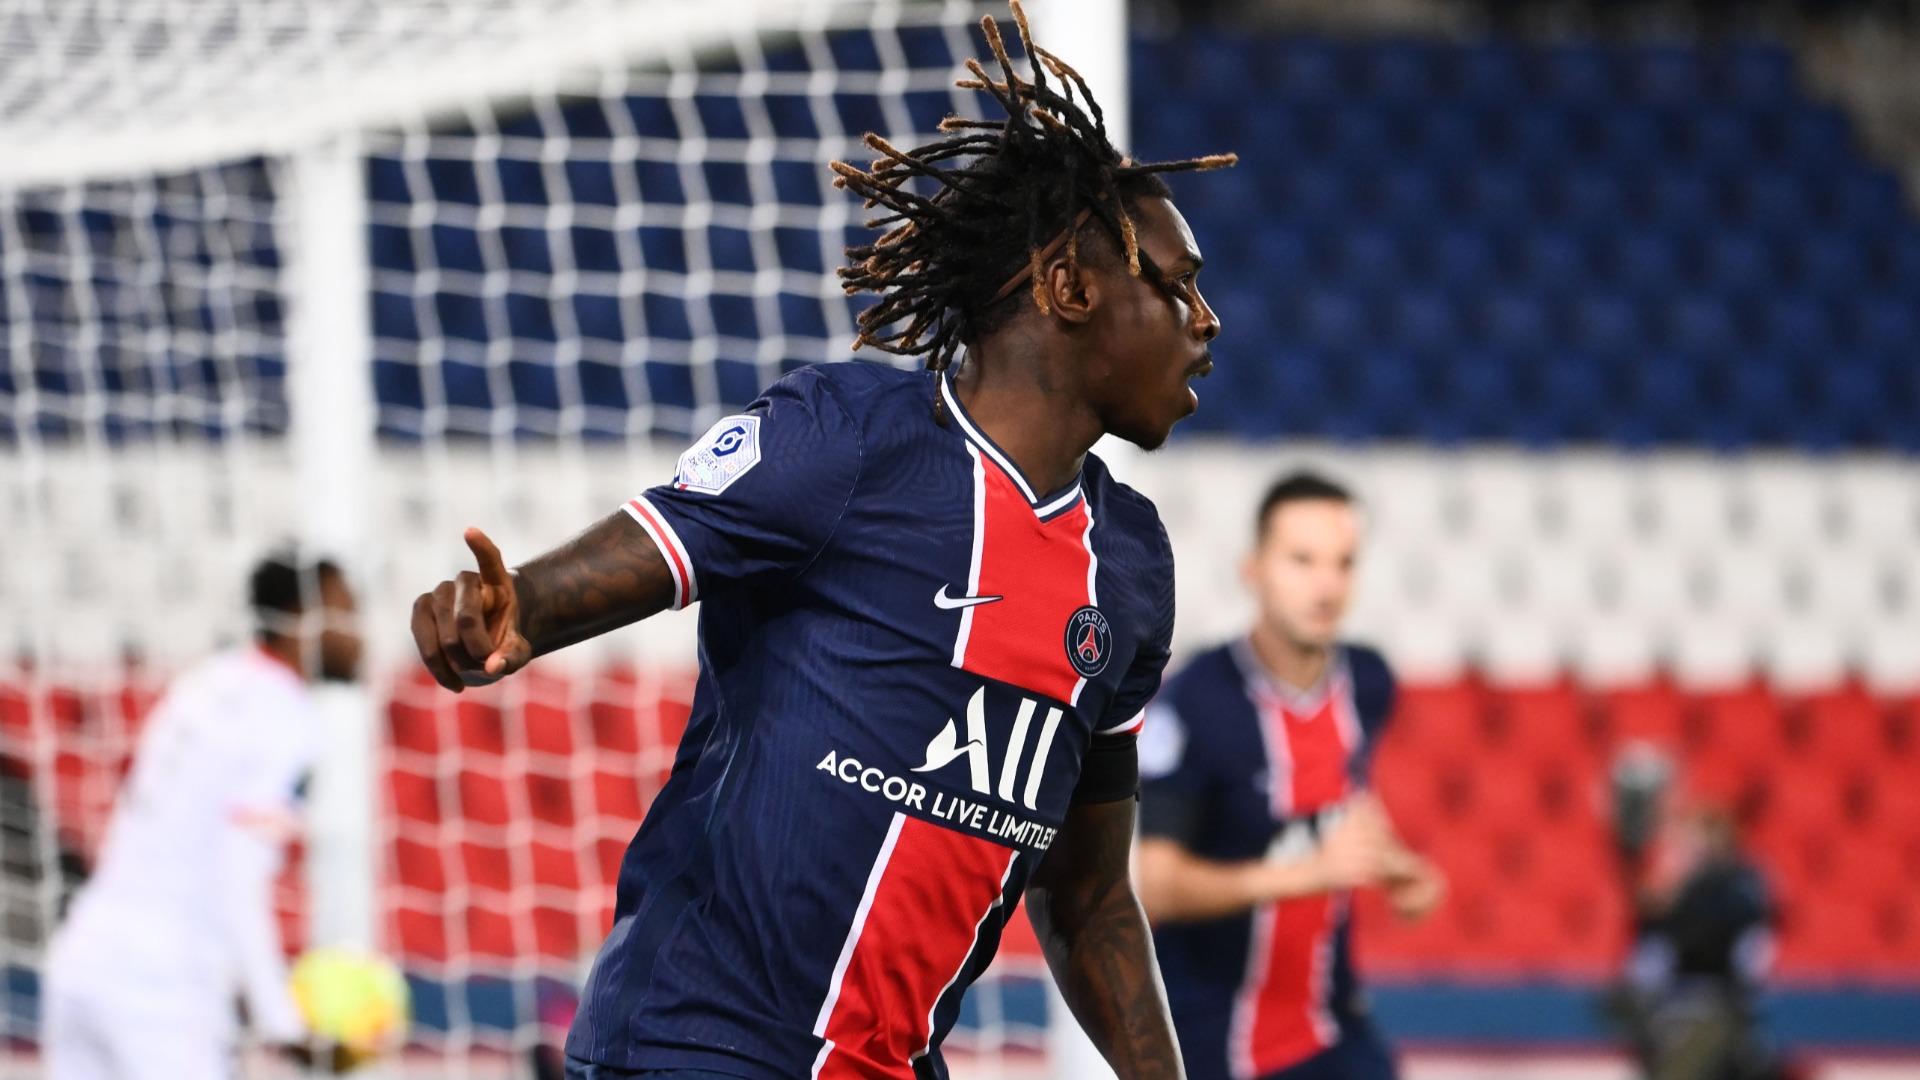 Paris Saint-Germain 4-0 Dijon: Kean off the mark with first-half double